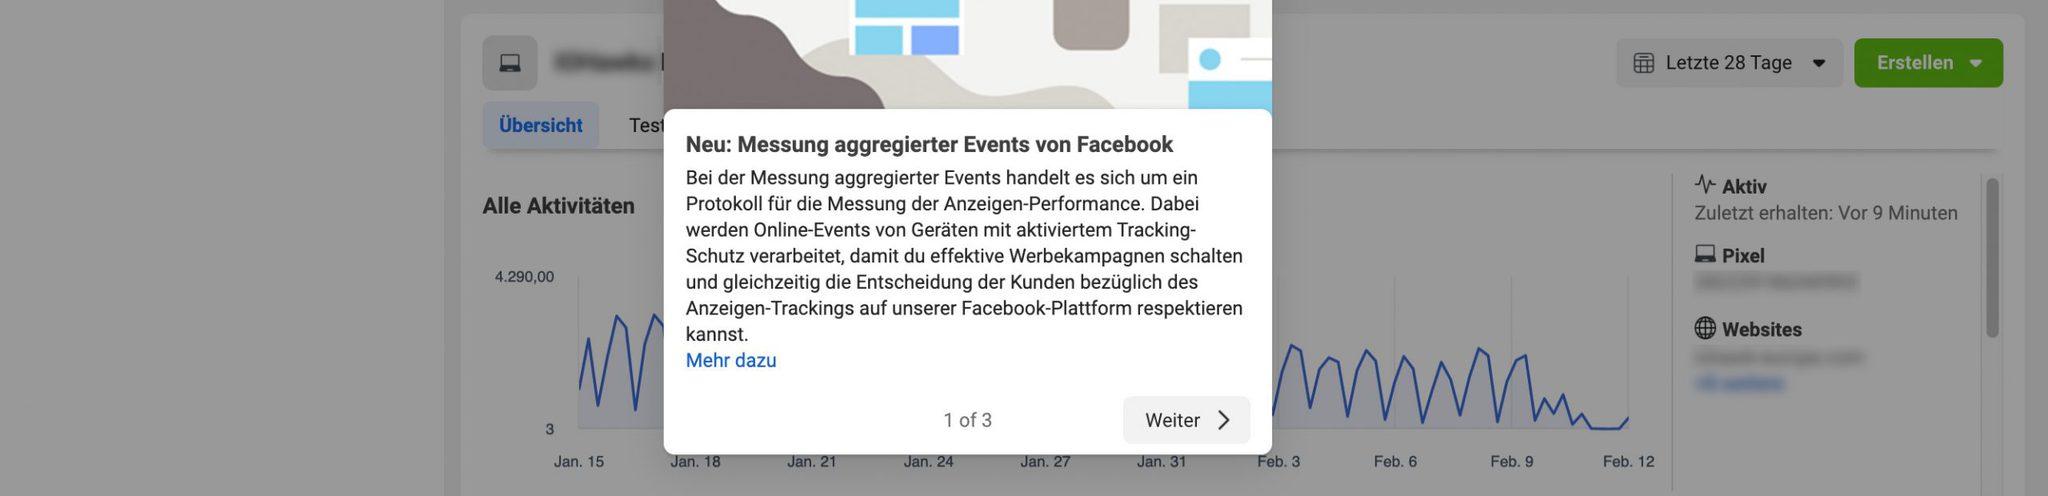 facebook messung aggregierter Events